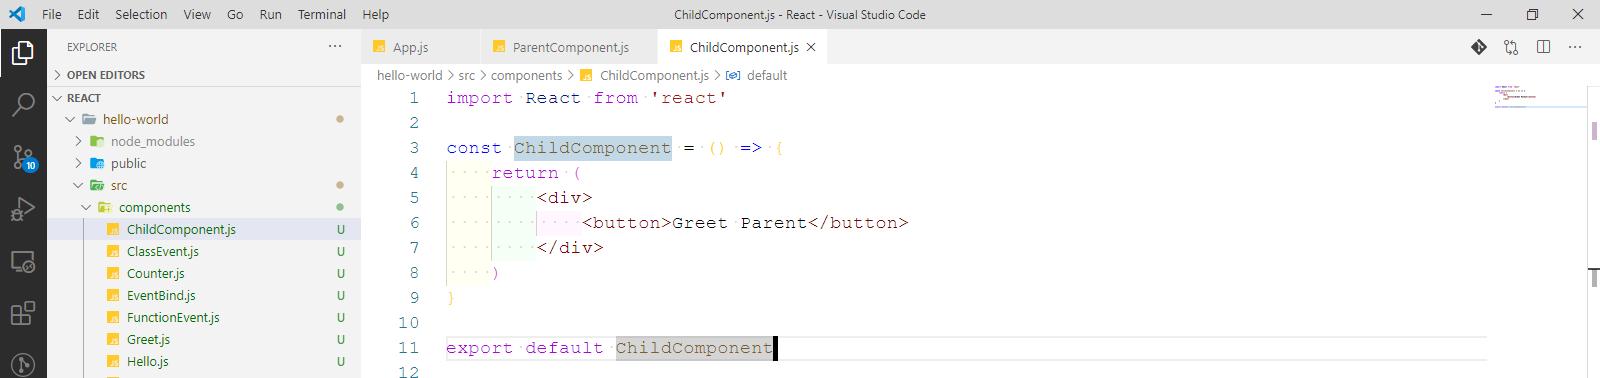 ChildComponent